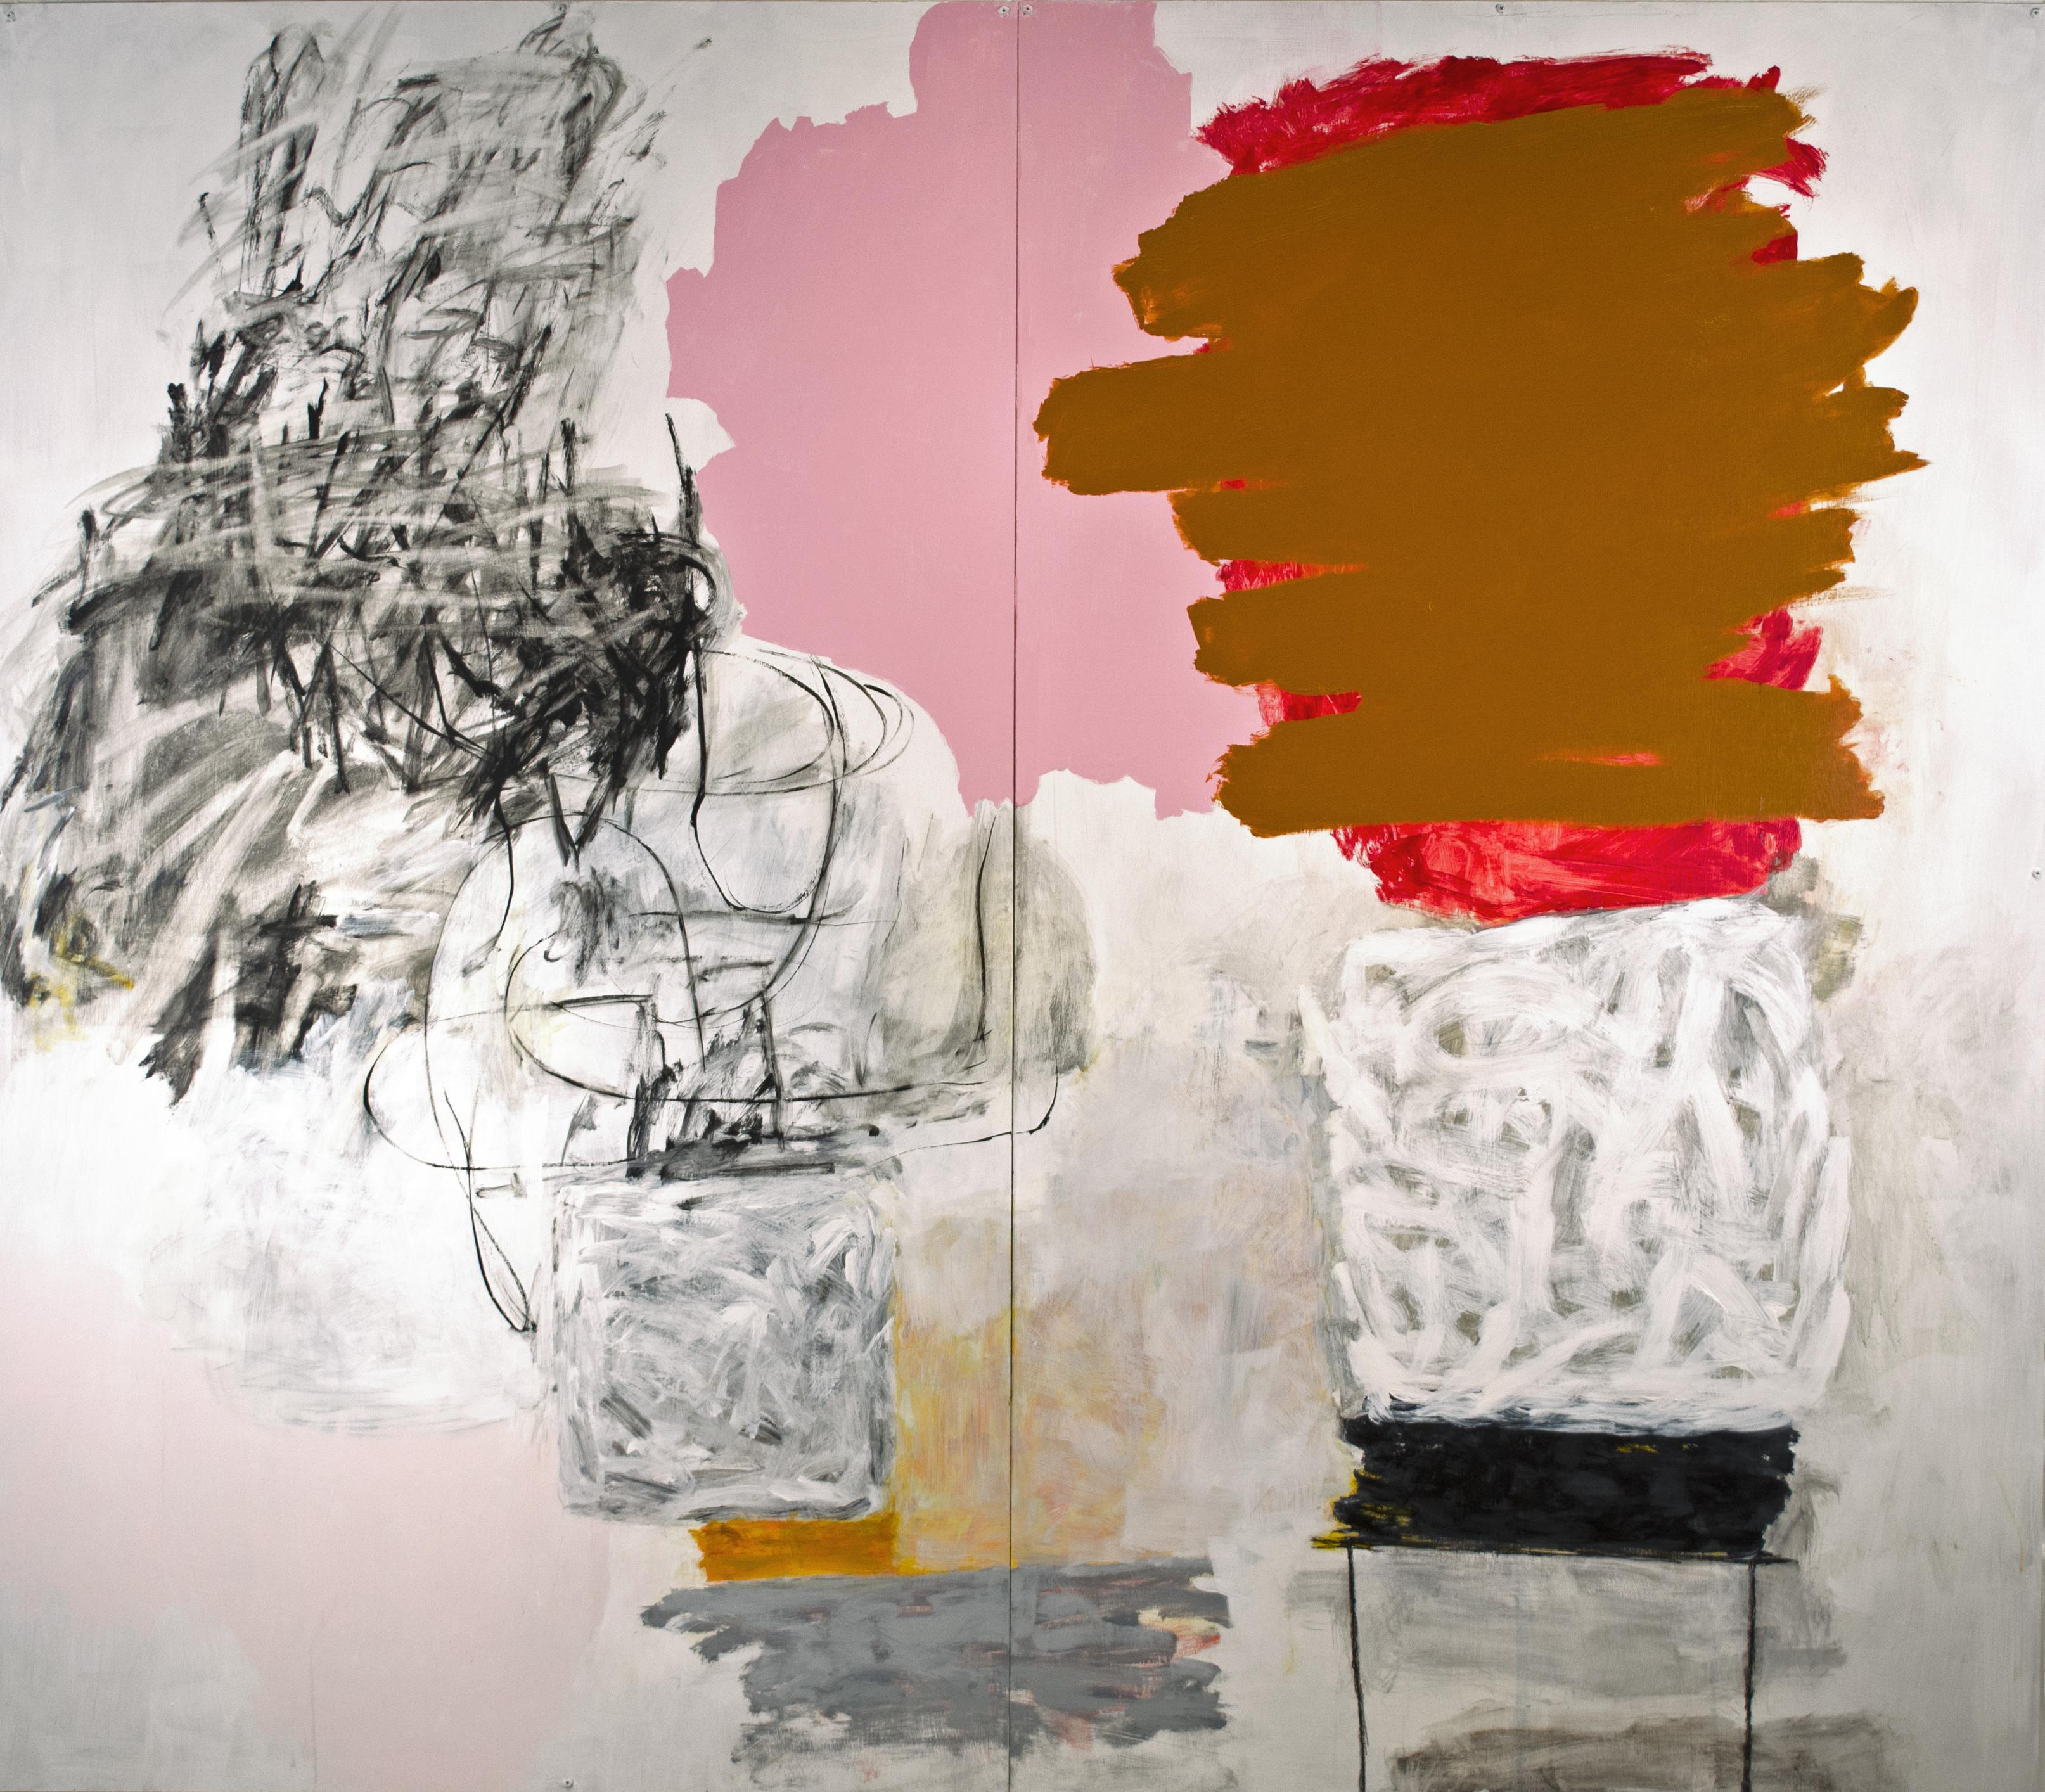 Rocio Rodriguez, October, 29 2014, 2014, pastel, oil pastel, 18 x 24 inches